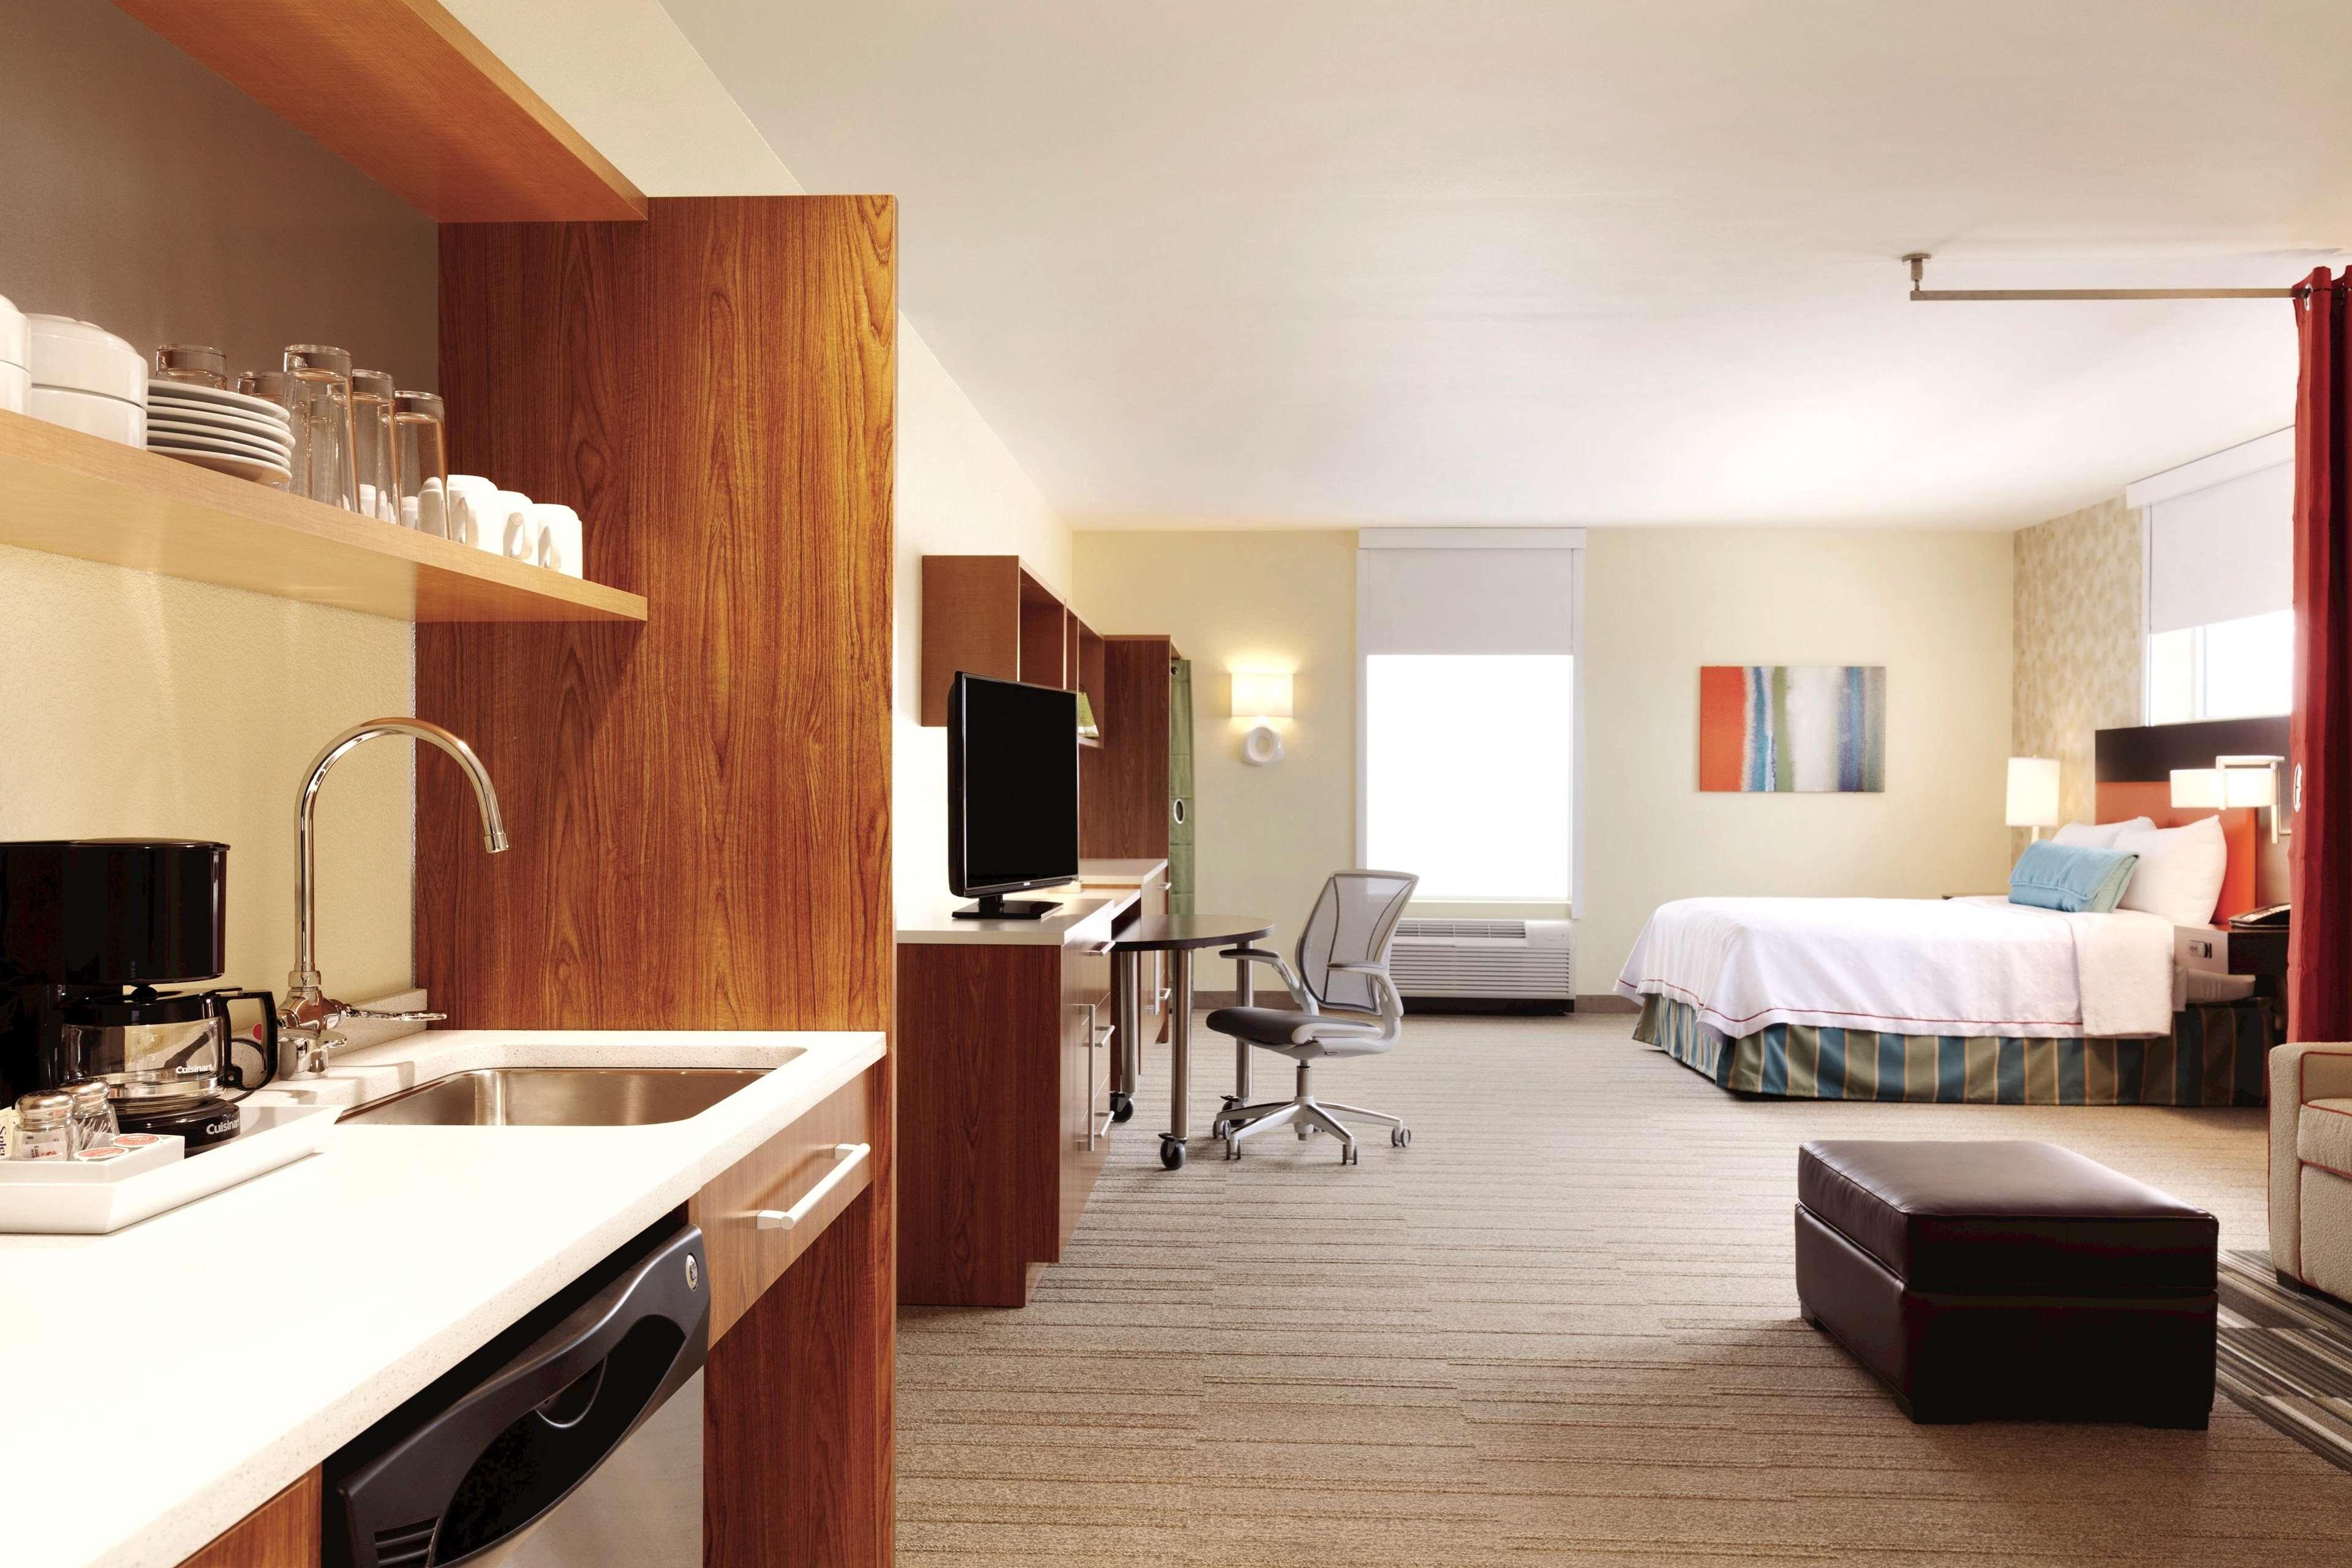 Home2 Suites by Hilton Austin Round Rock image 12